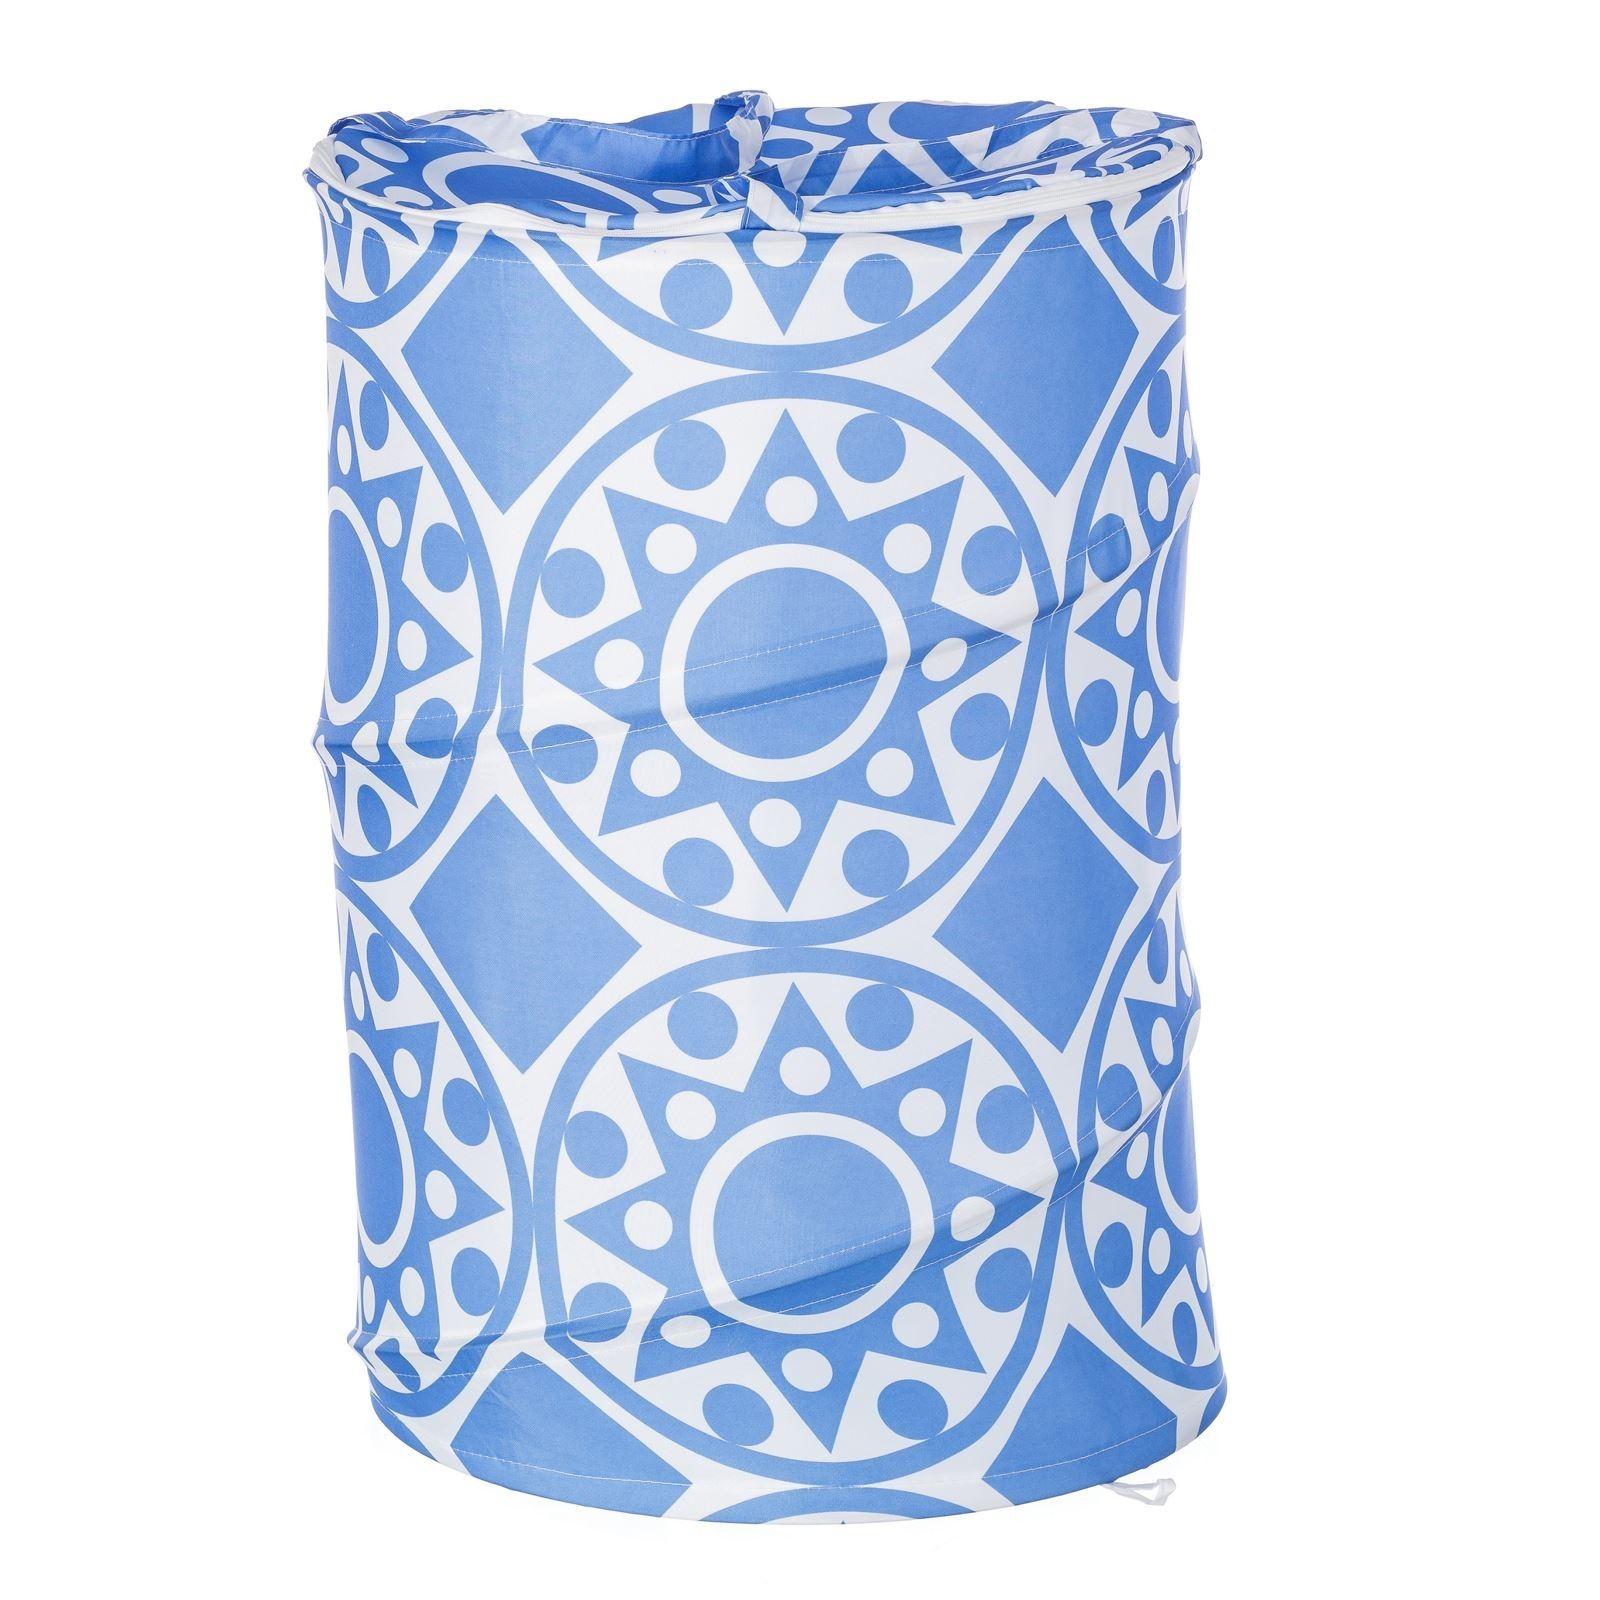 Pongotodo for bathroom blue ethnic